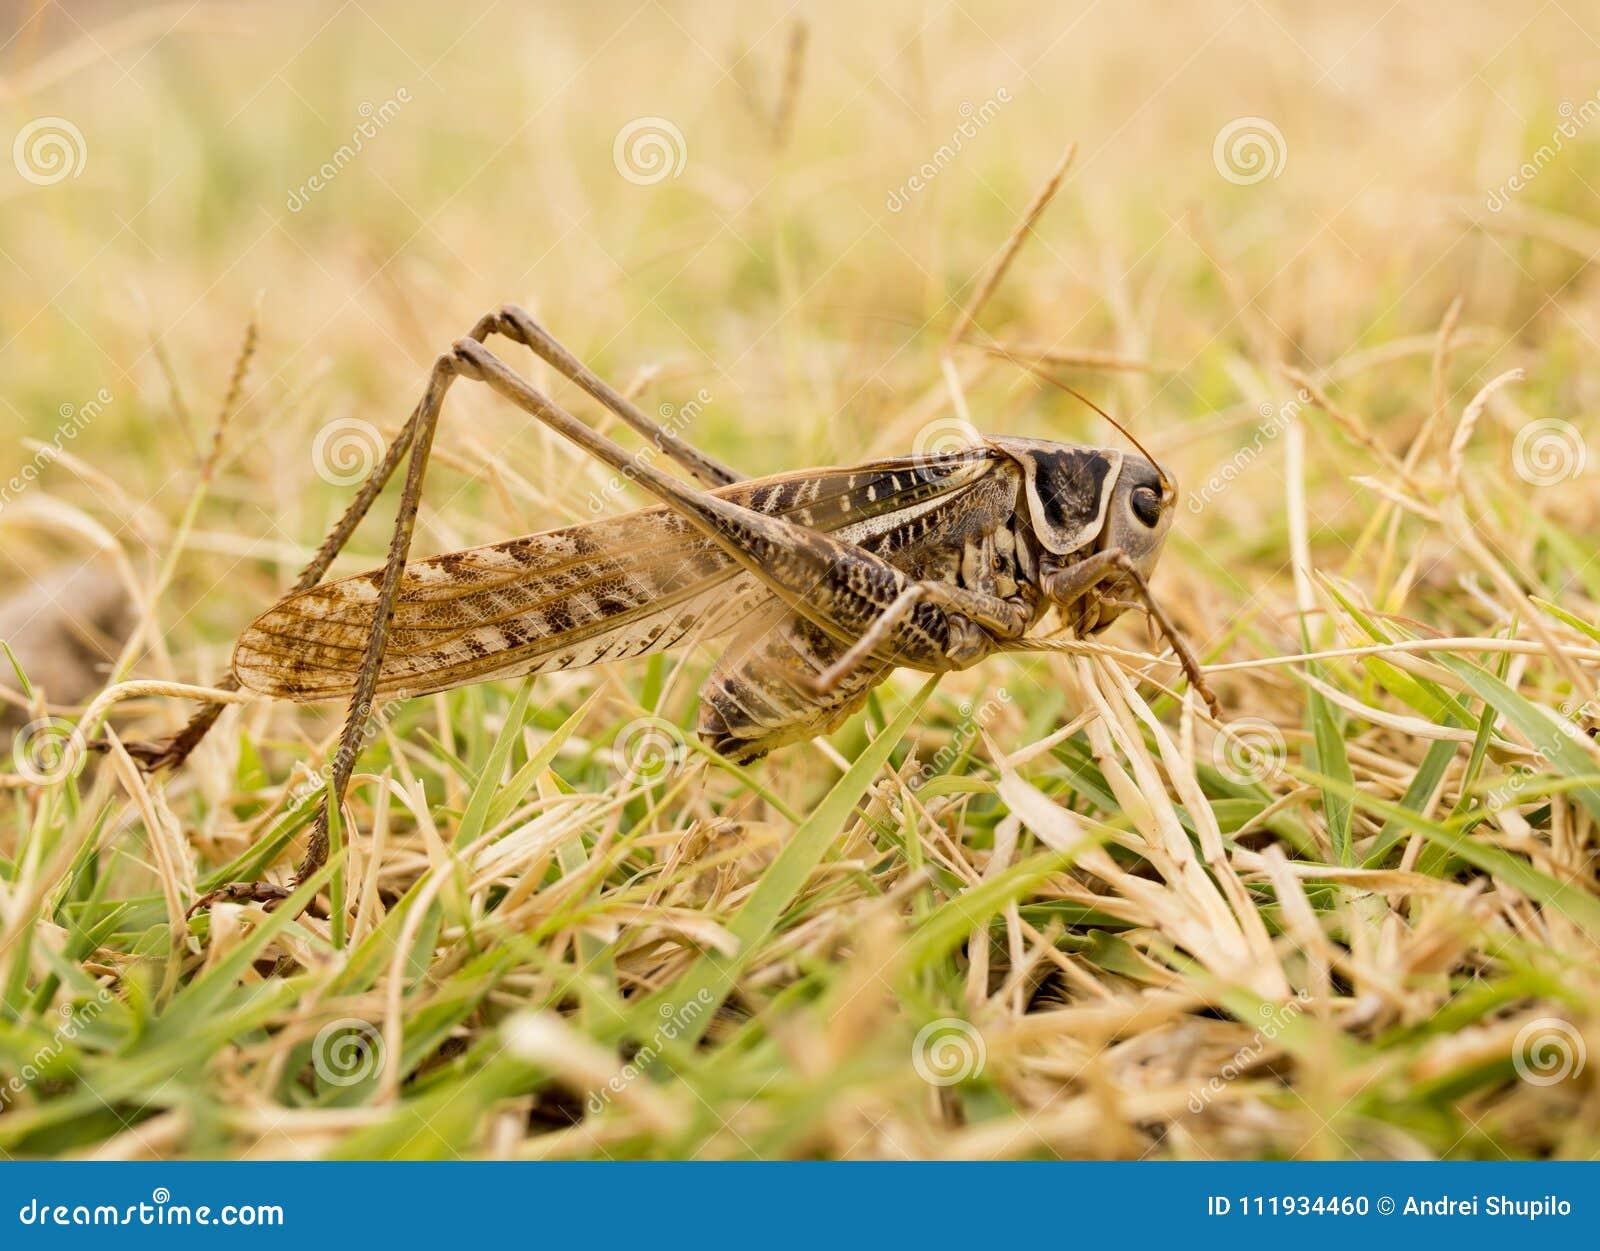 Grasshopper in nature. macro